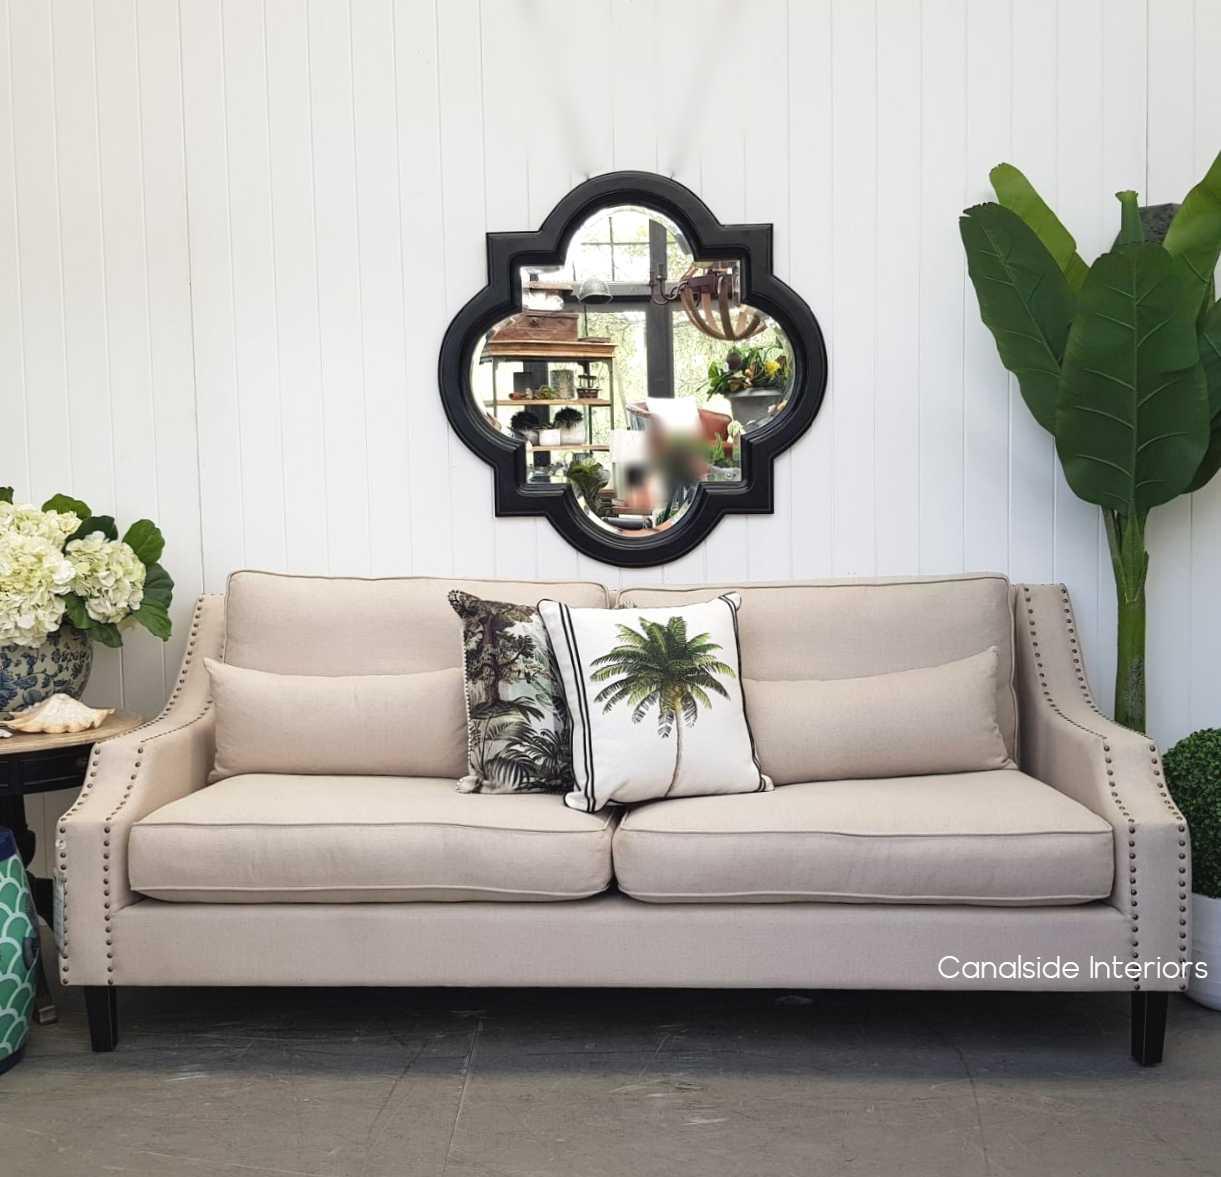 Cadence Mirror Distressed Black 100cm  HAMPTONS Style, PLANTATION Style, MIRRORS